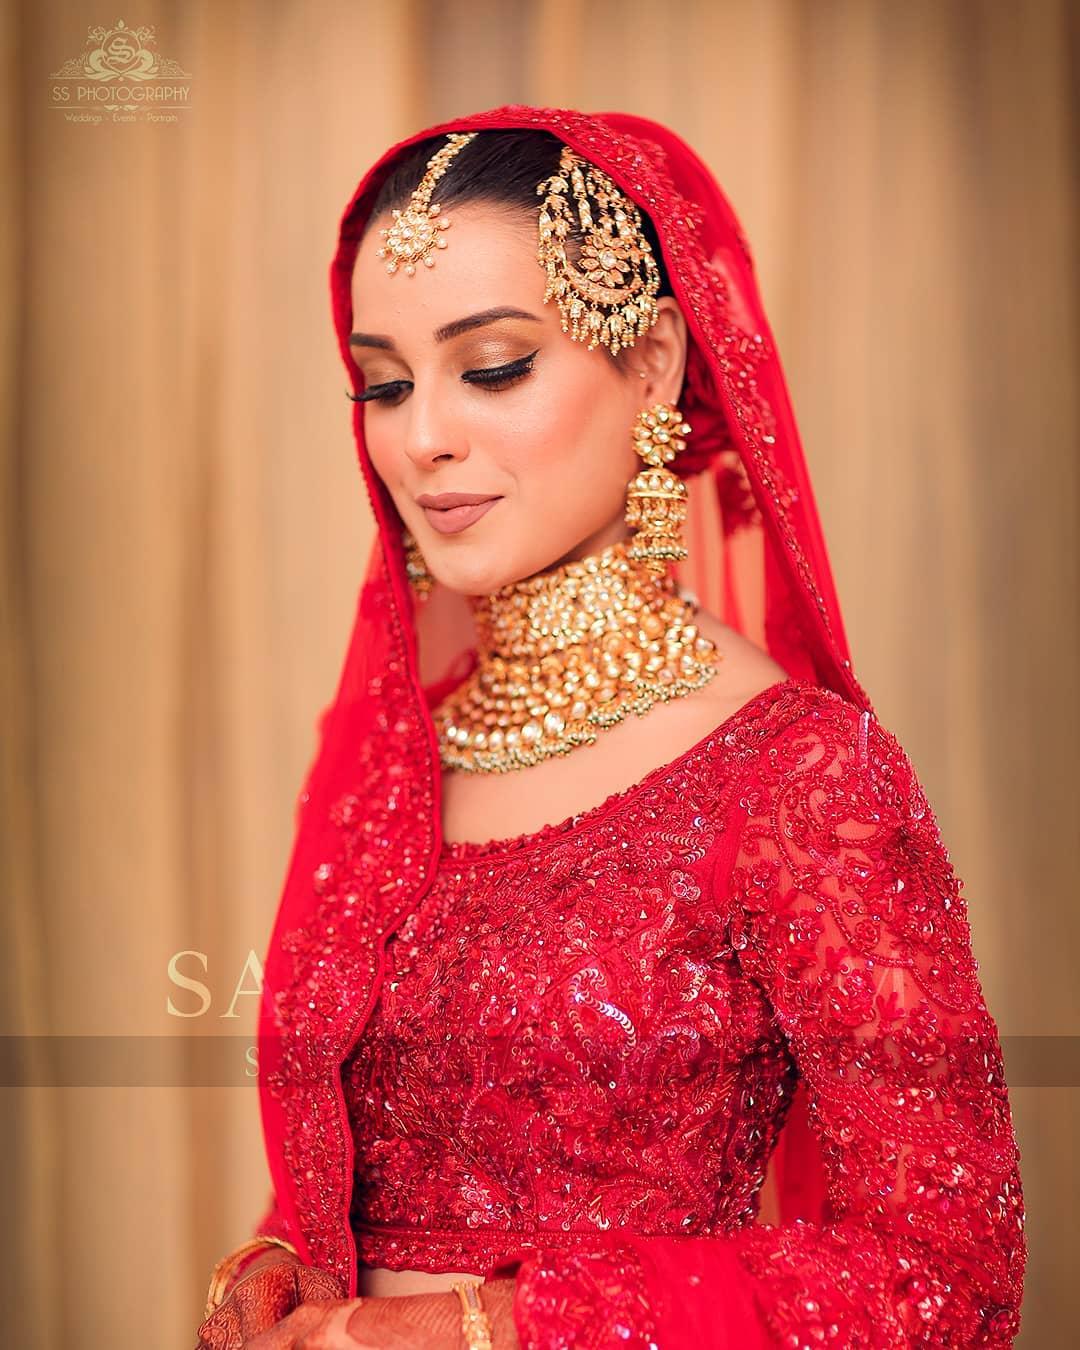 Iqra Aziz and Yasir Hussain Wedding Pictures (40)